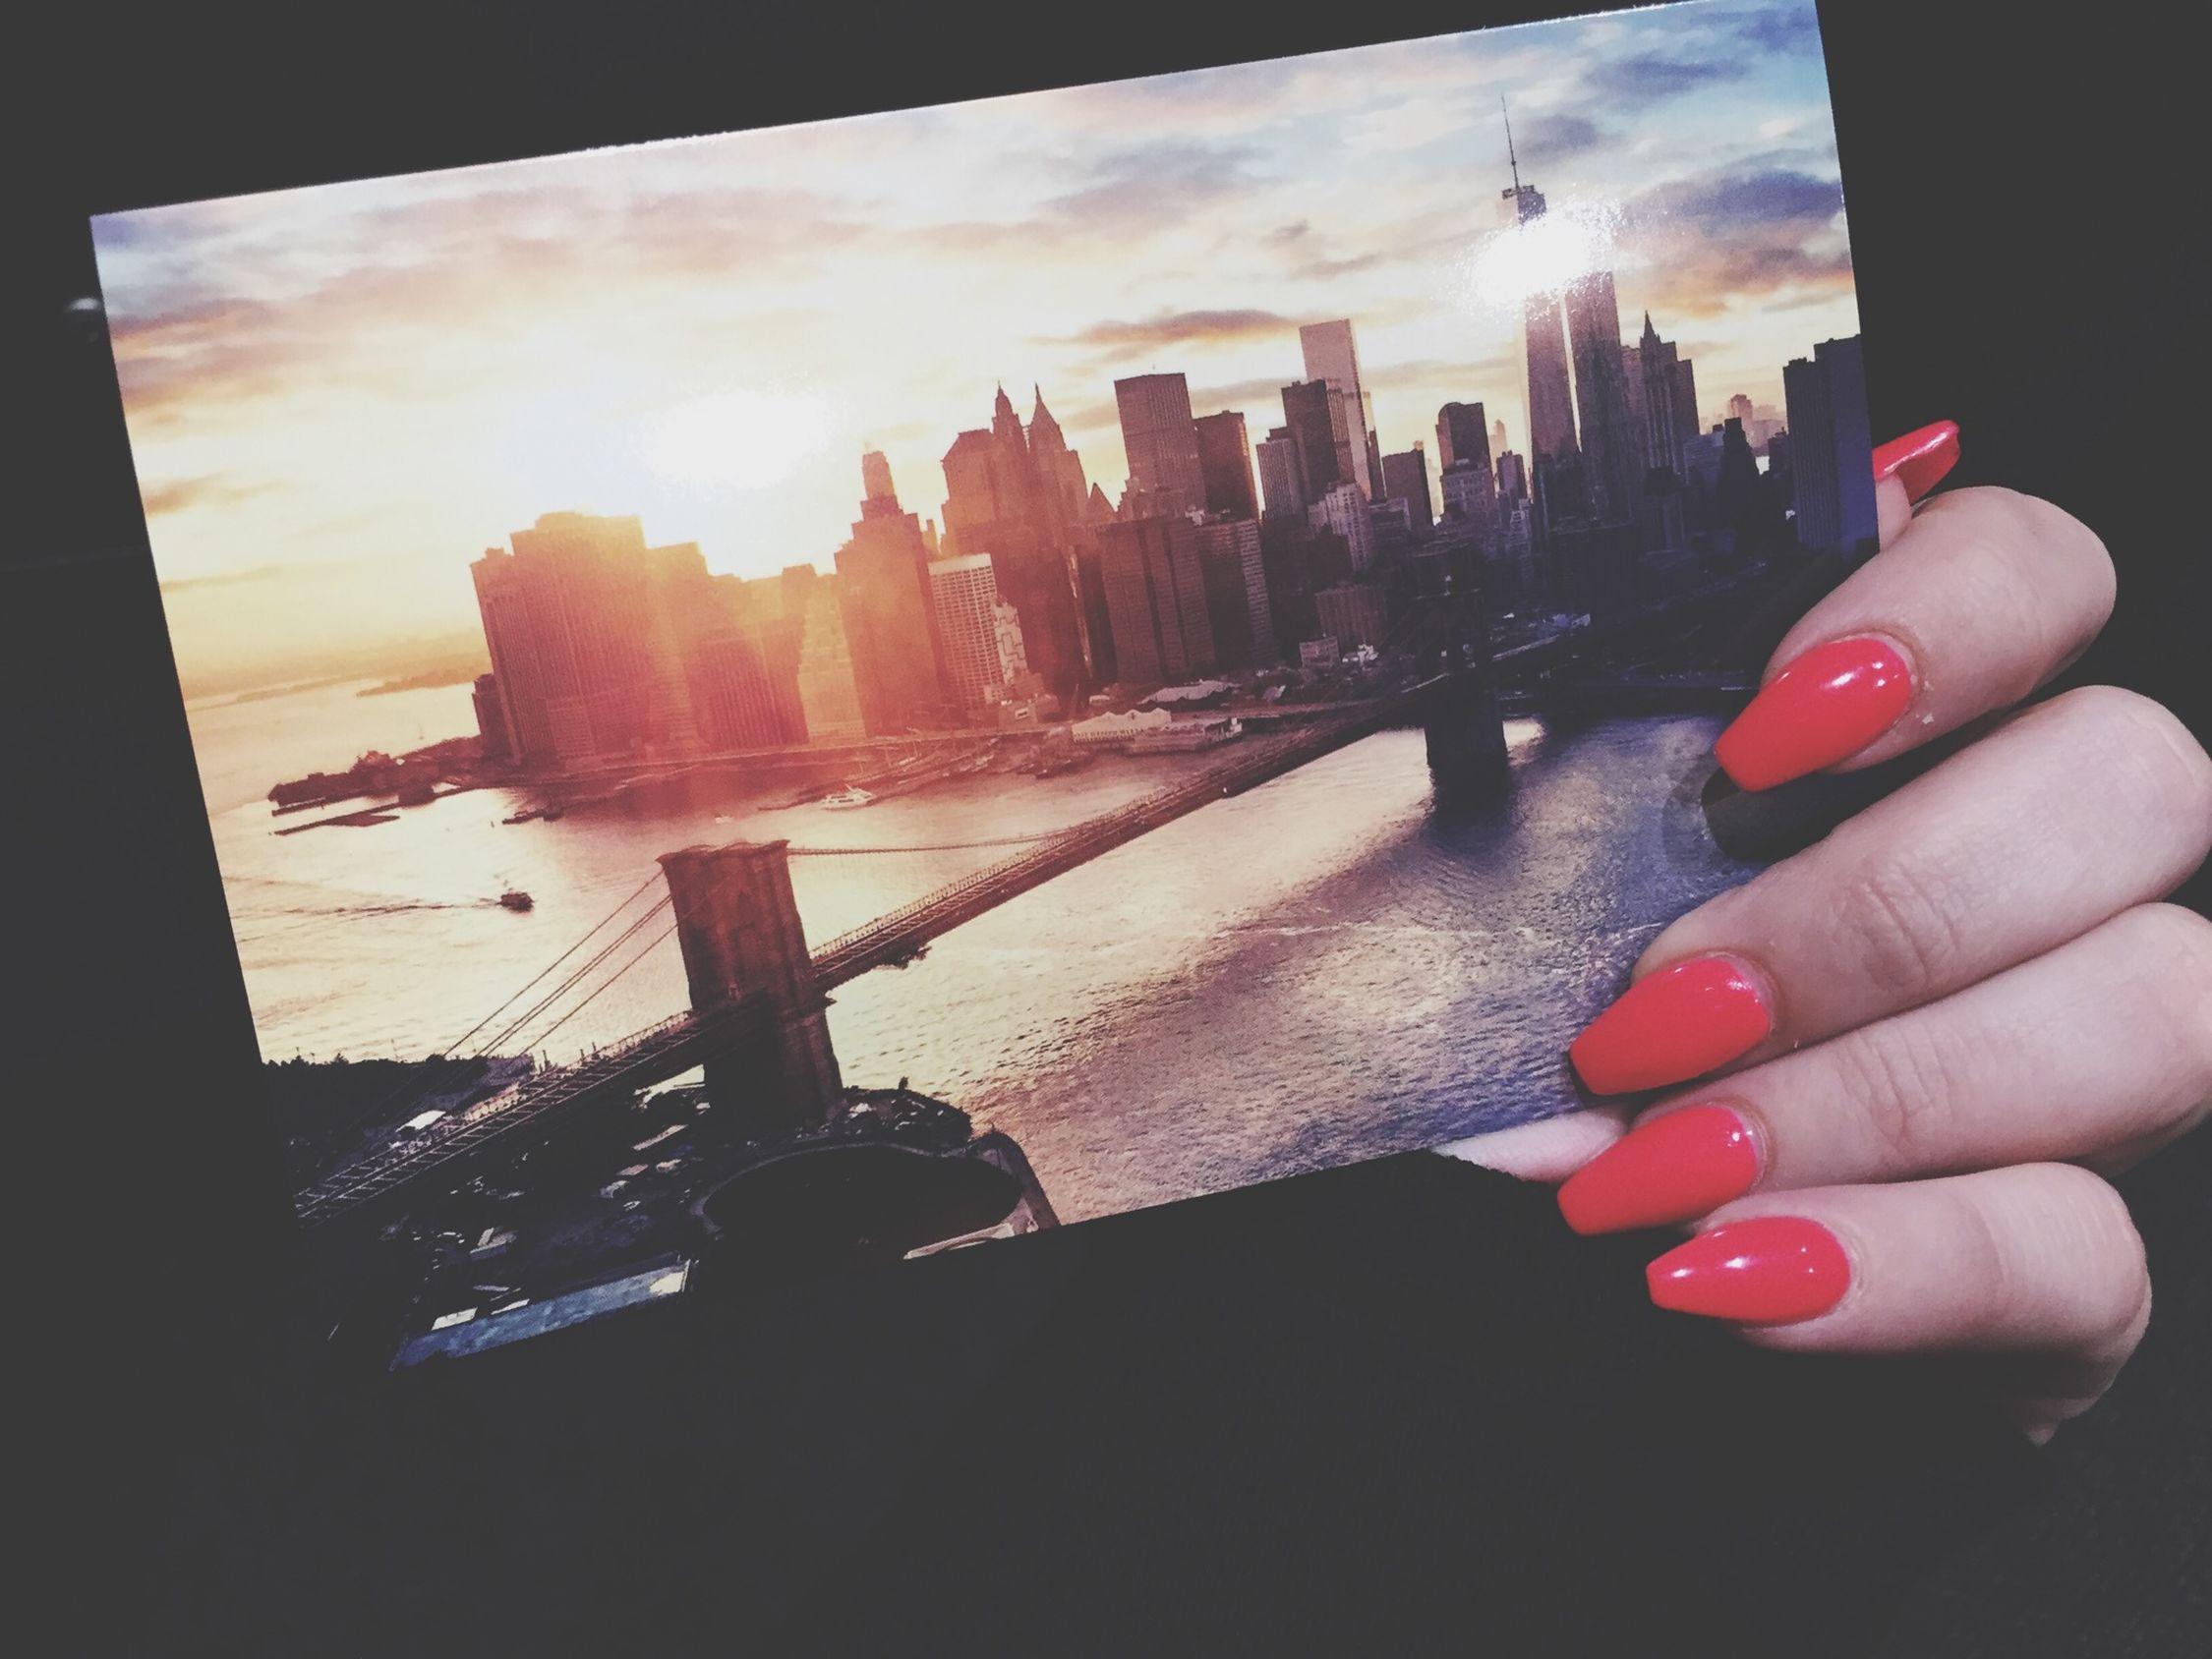 New York City Sendinglove Friends ❤ Missing You Travel Seeyousoon